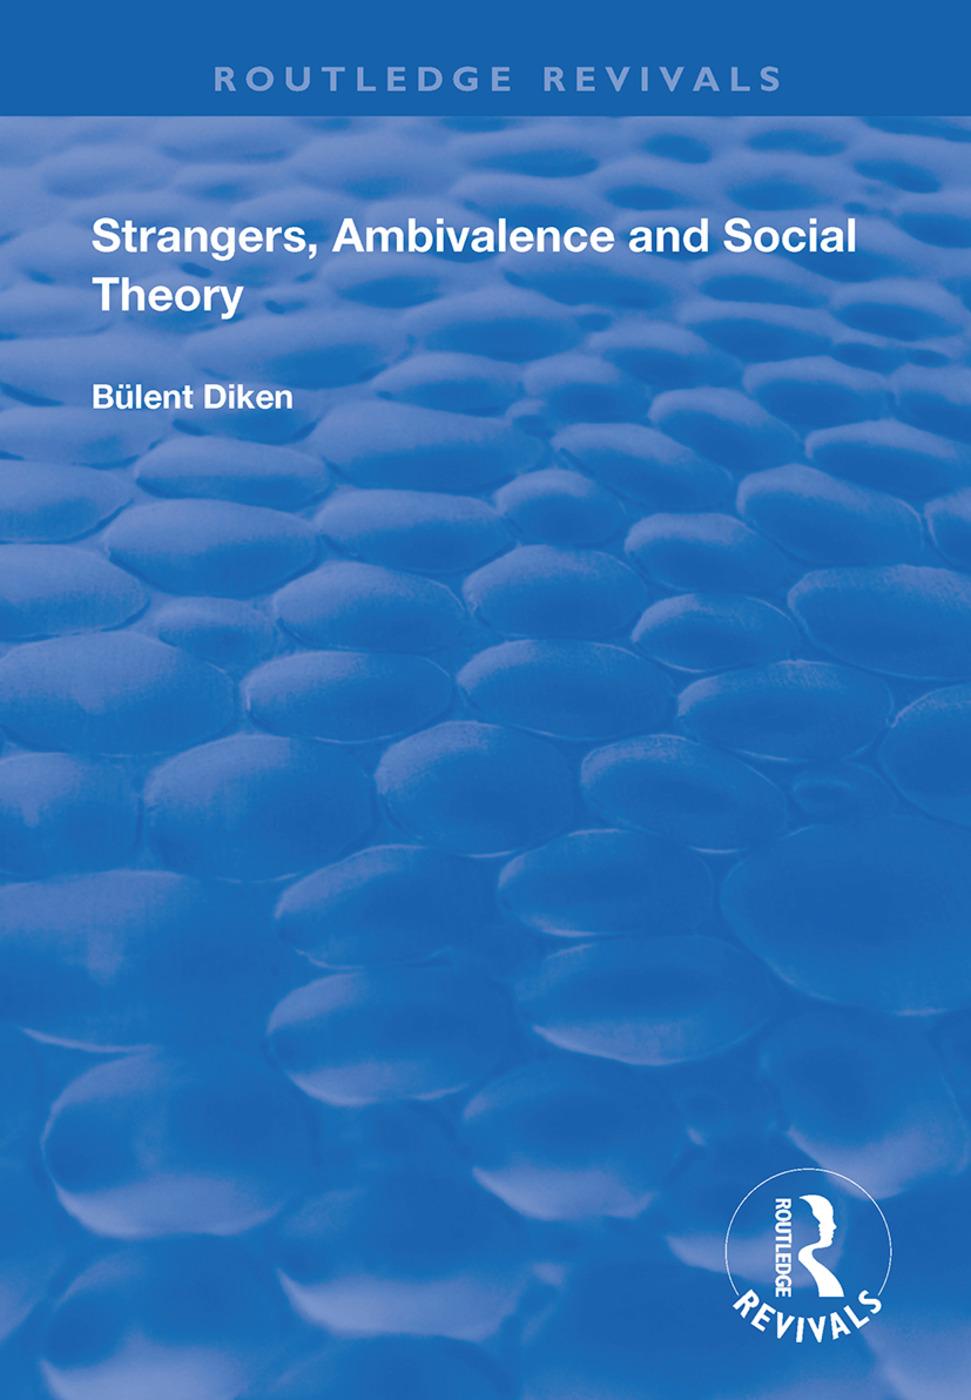 Strangers, Ambivalence and Social Theory